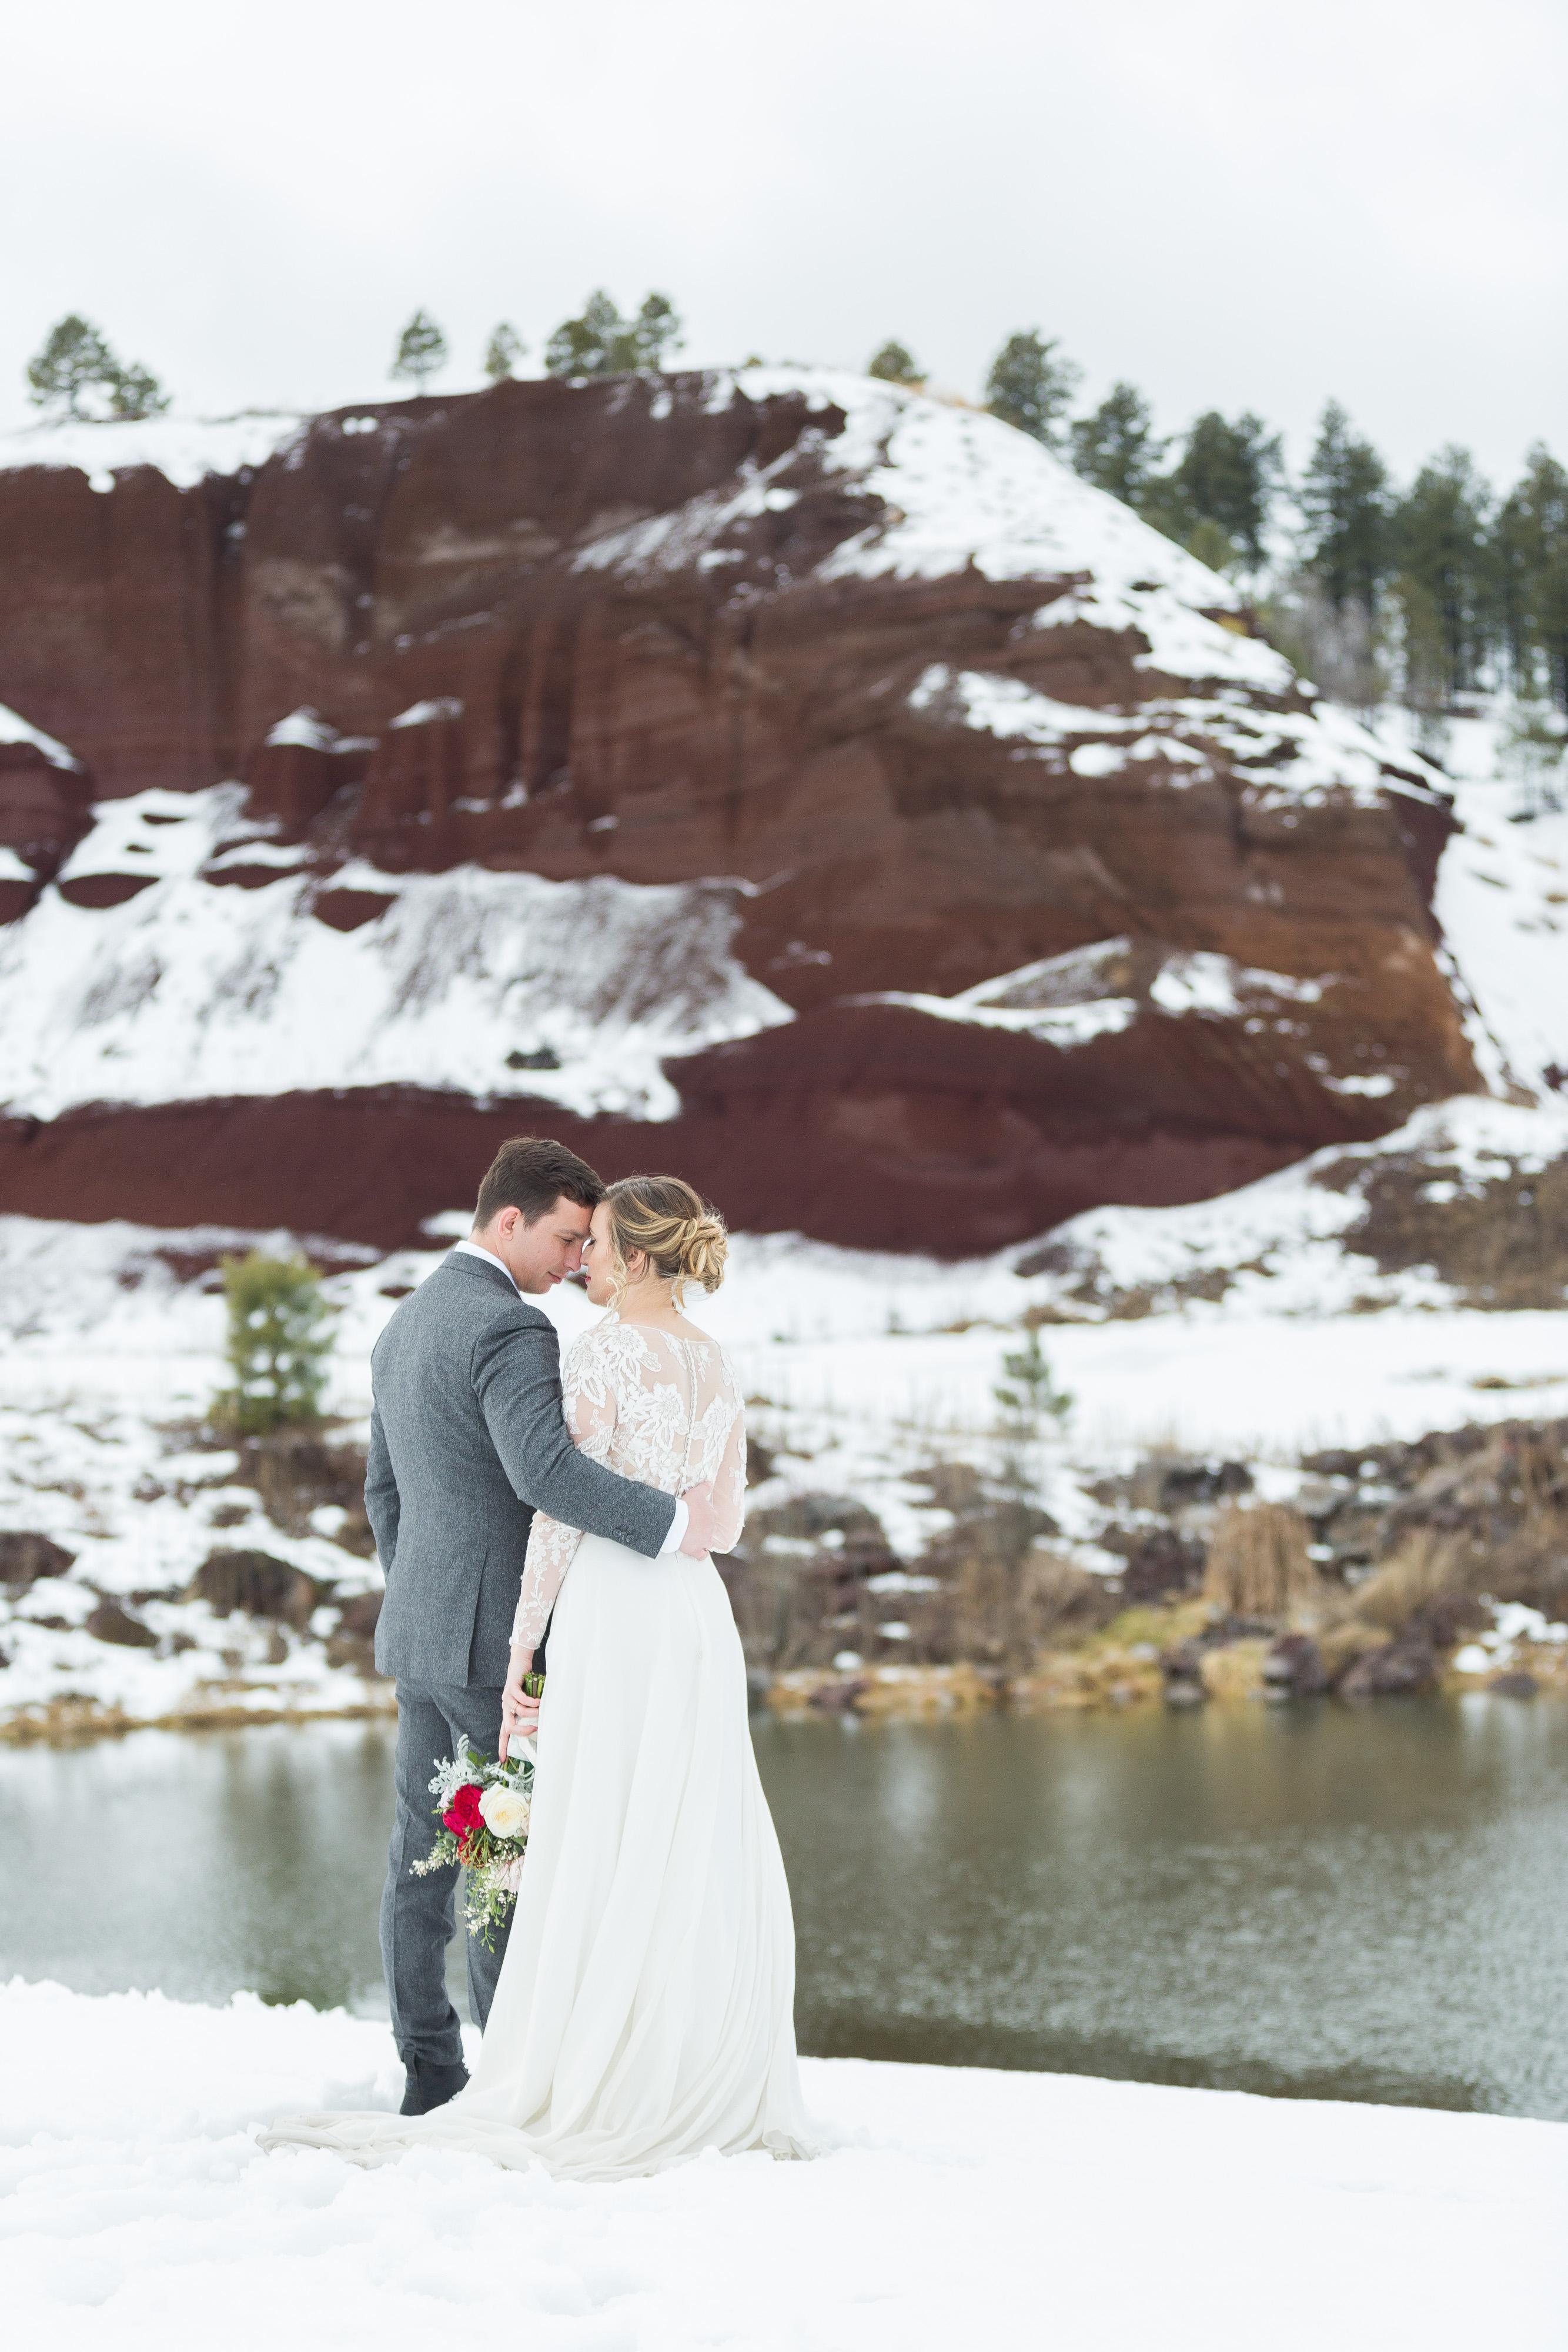 30 Dreamy Winter Wedding Photos